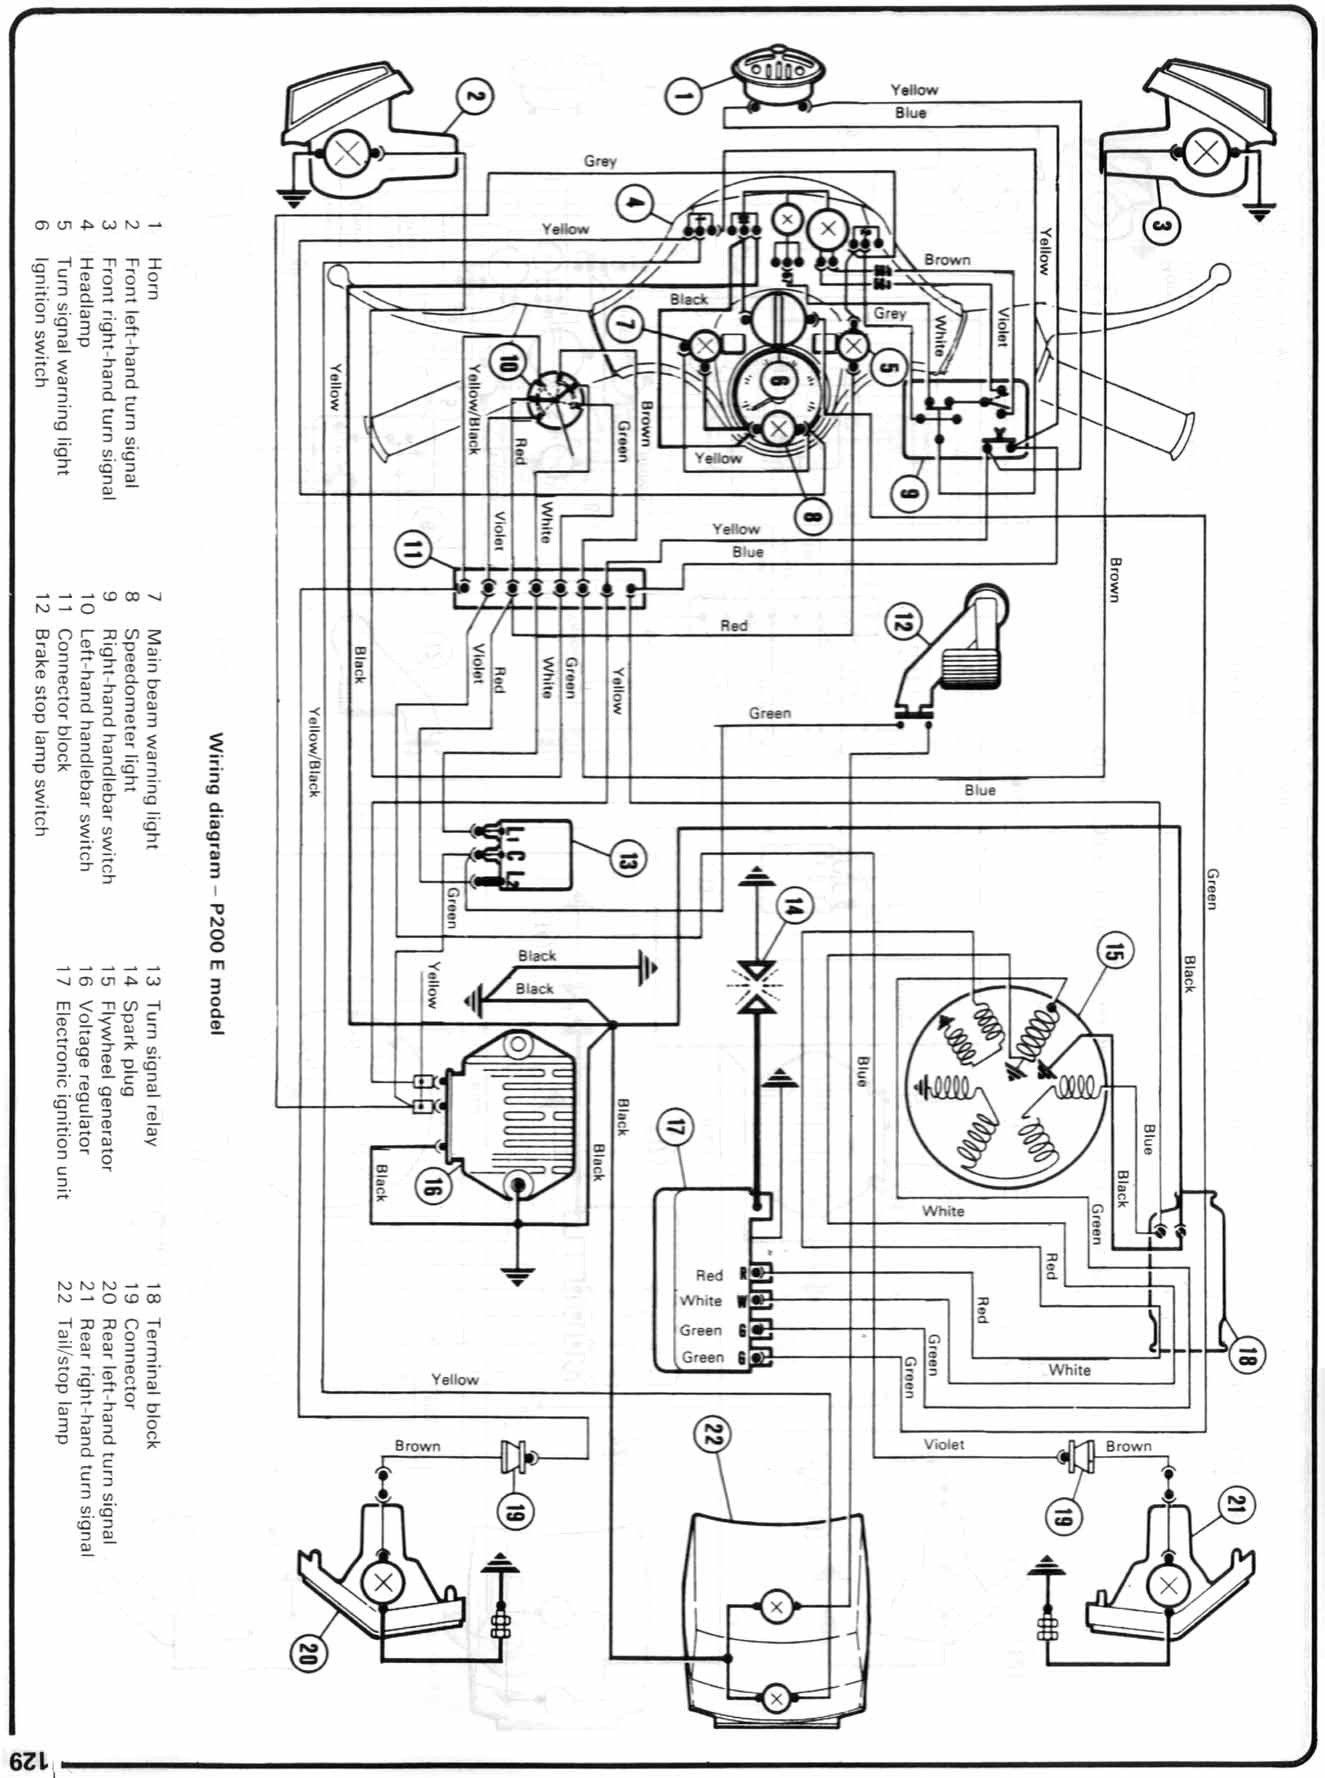 Unique Lambretta Ac Wiring Diagram Diagramsample Diagramformats